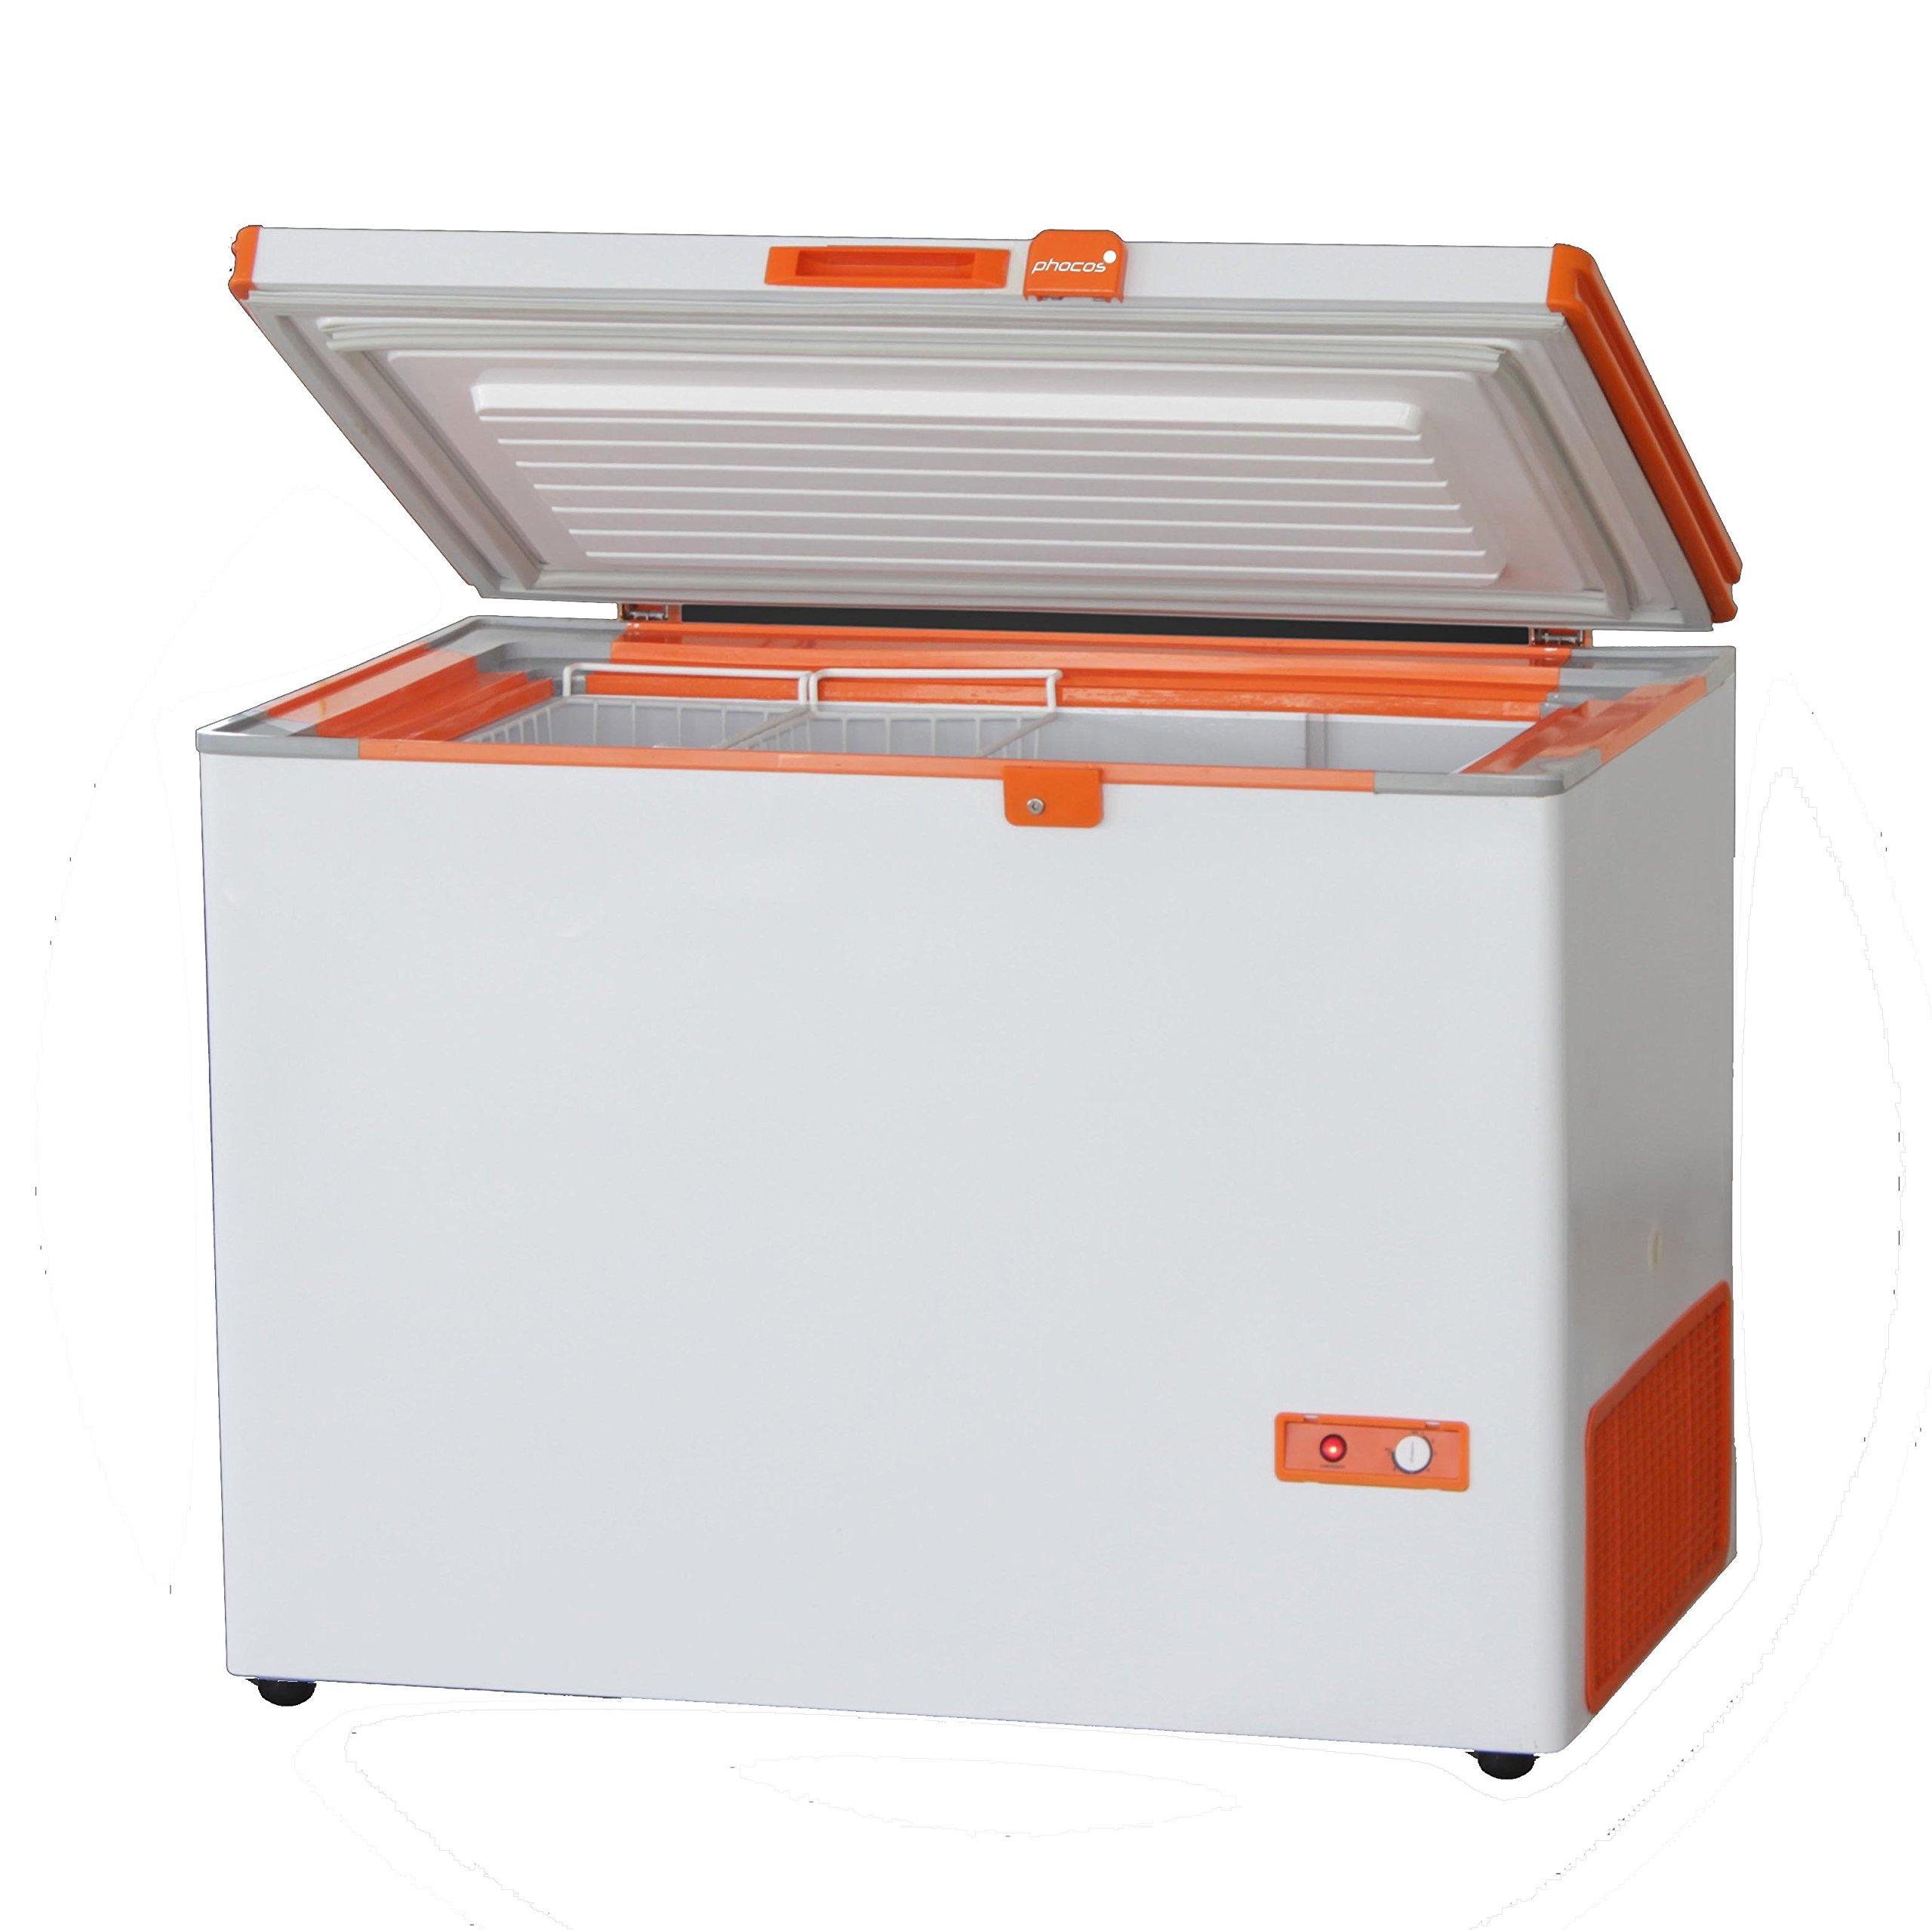 Phocos FR240MP DC Refrigerator/Freezer by Phocos